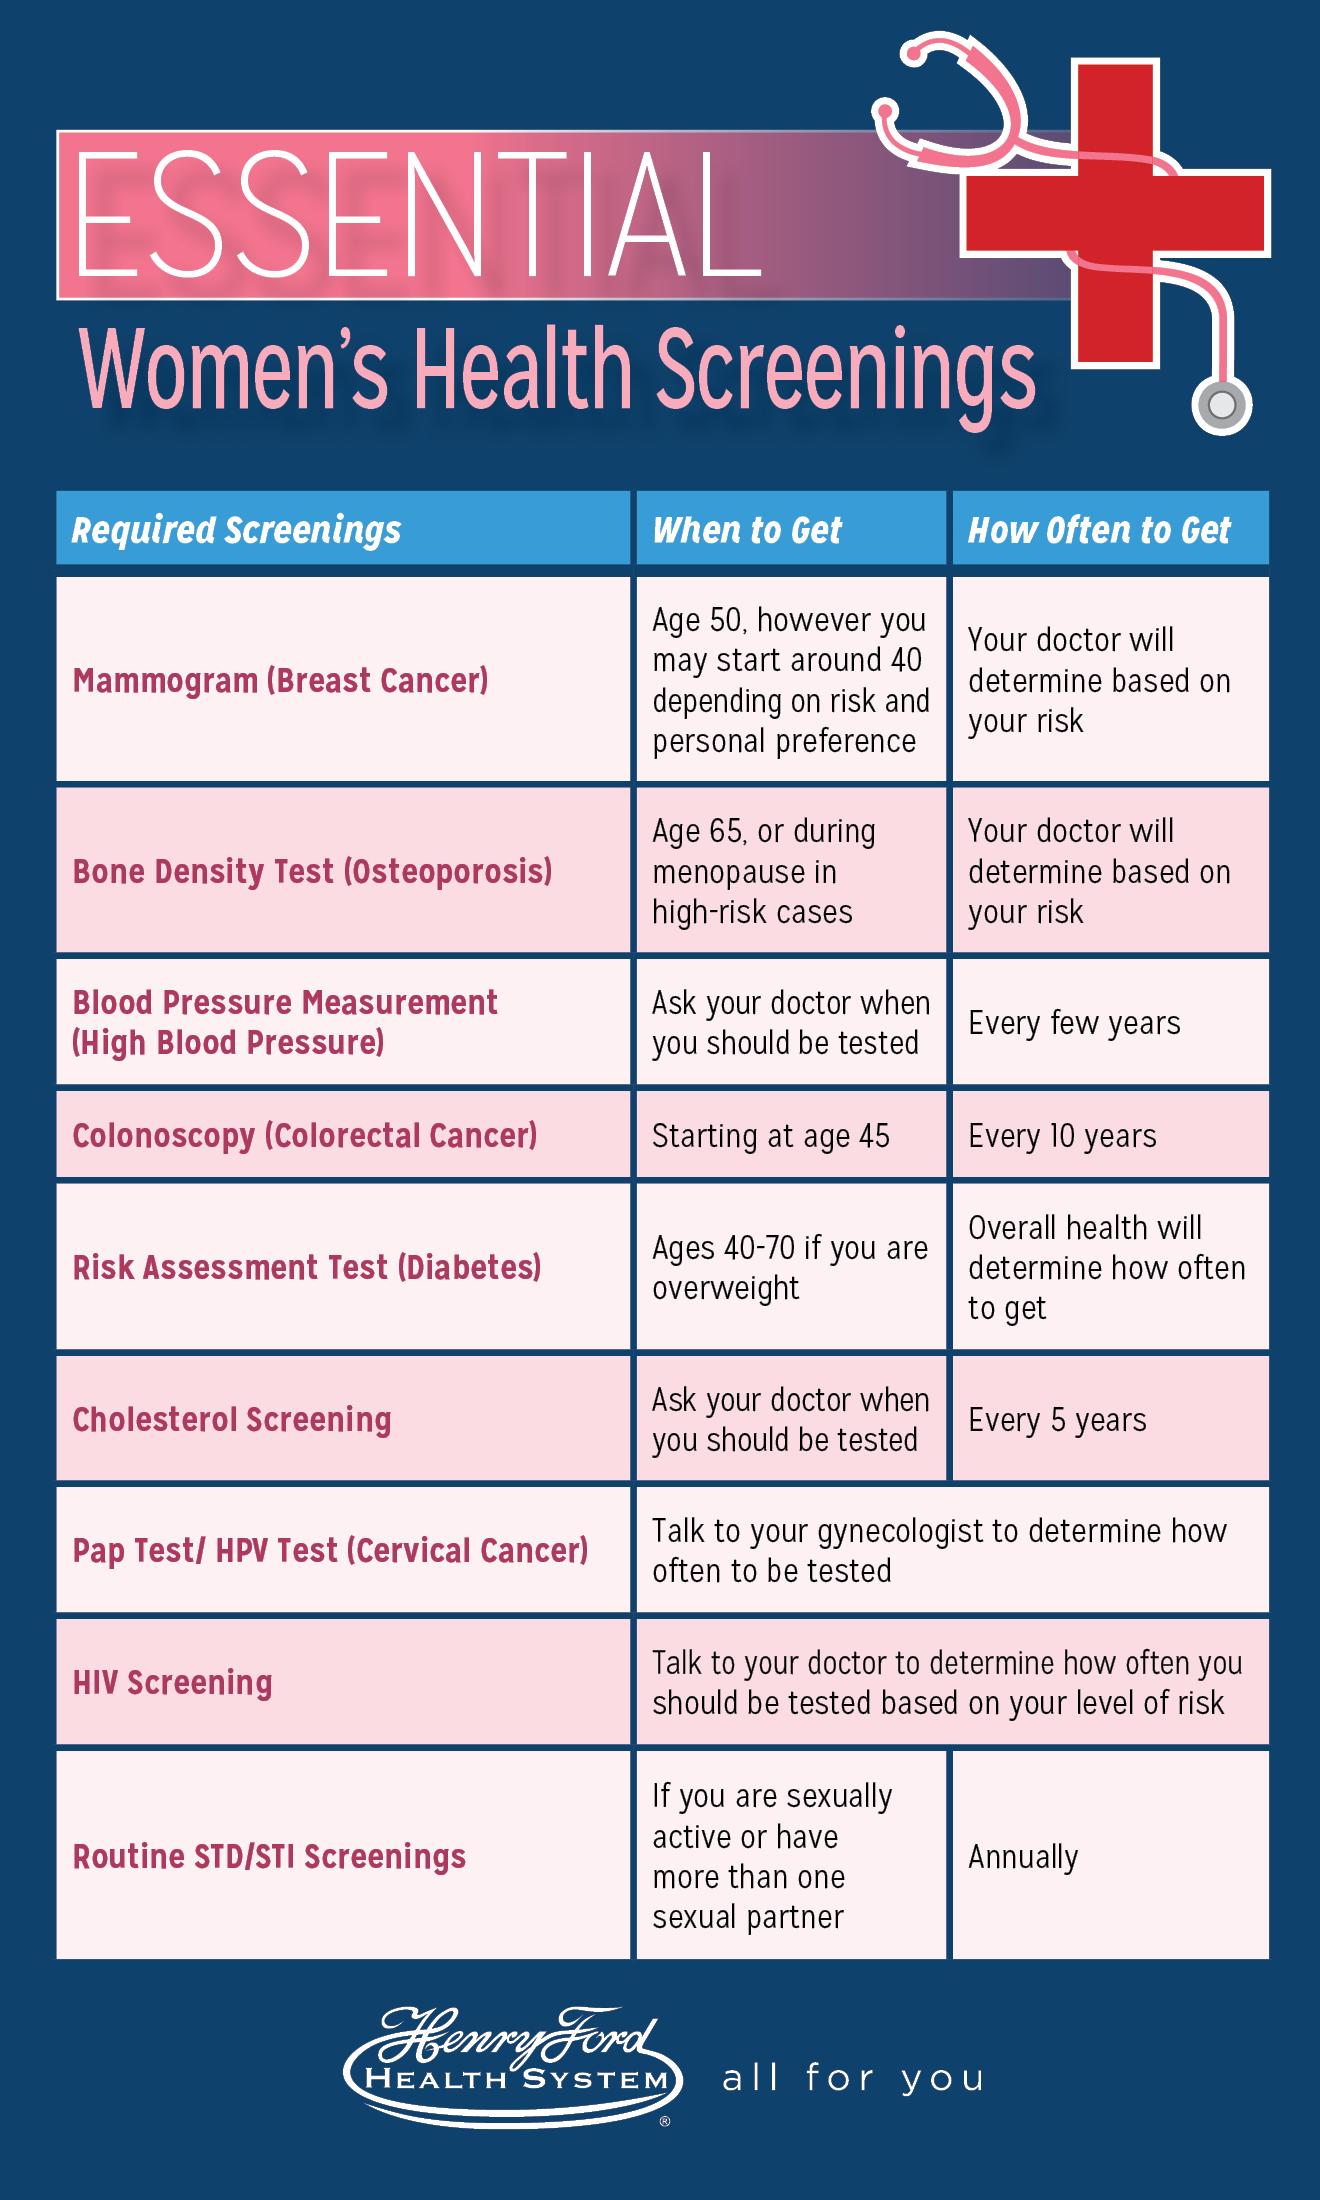 Woman health tips